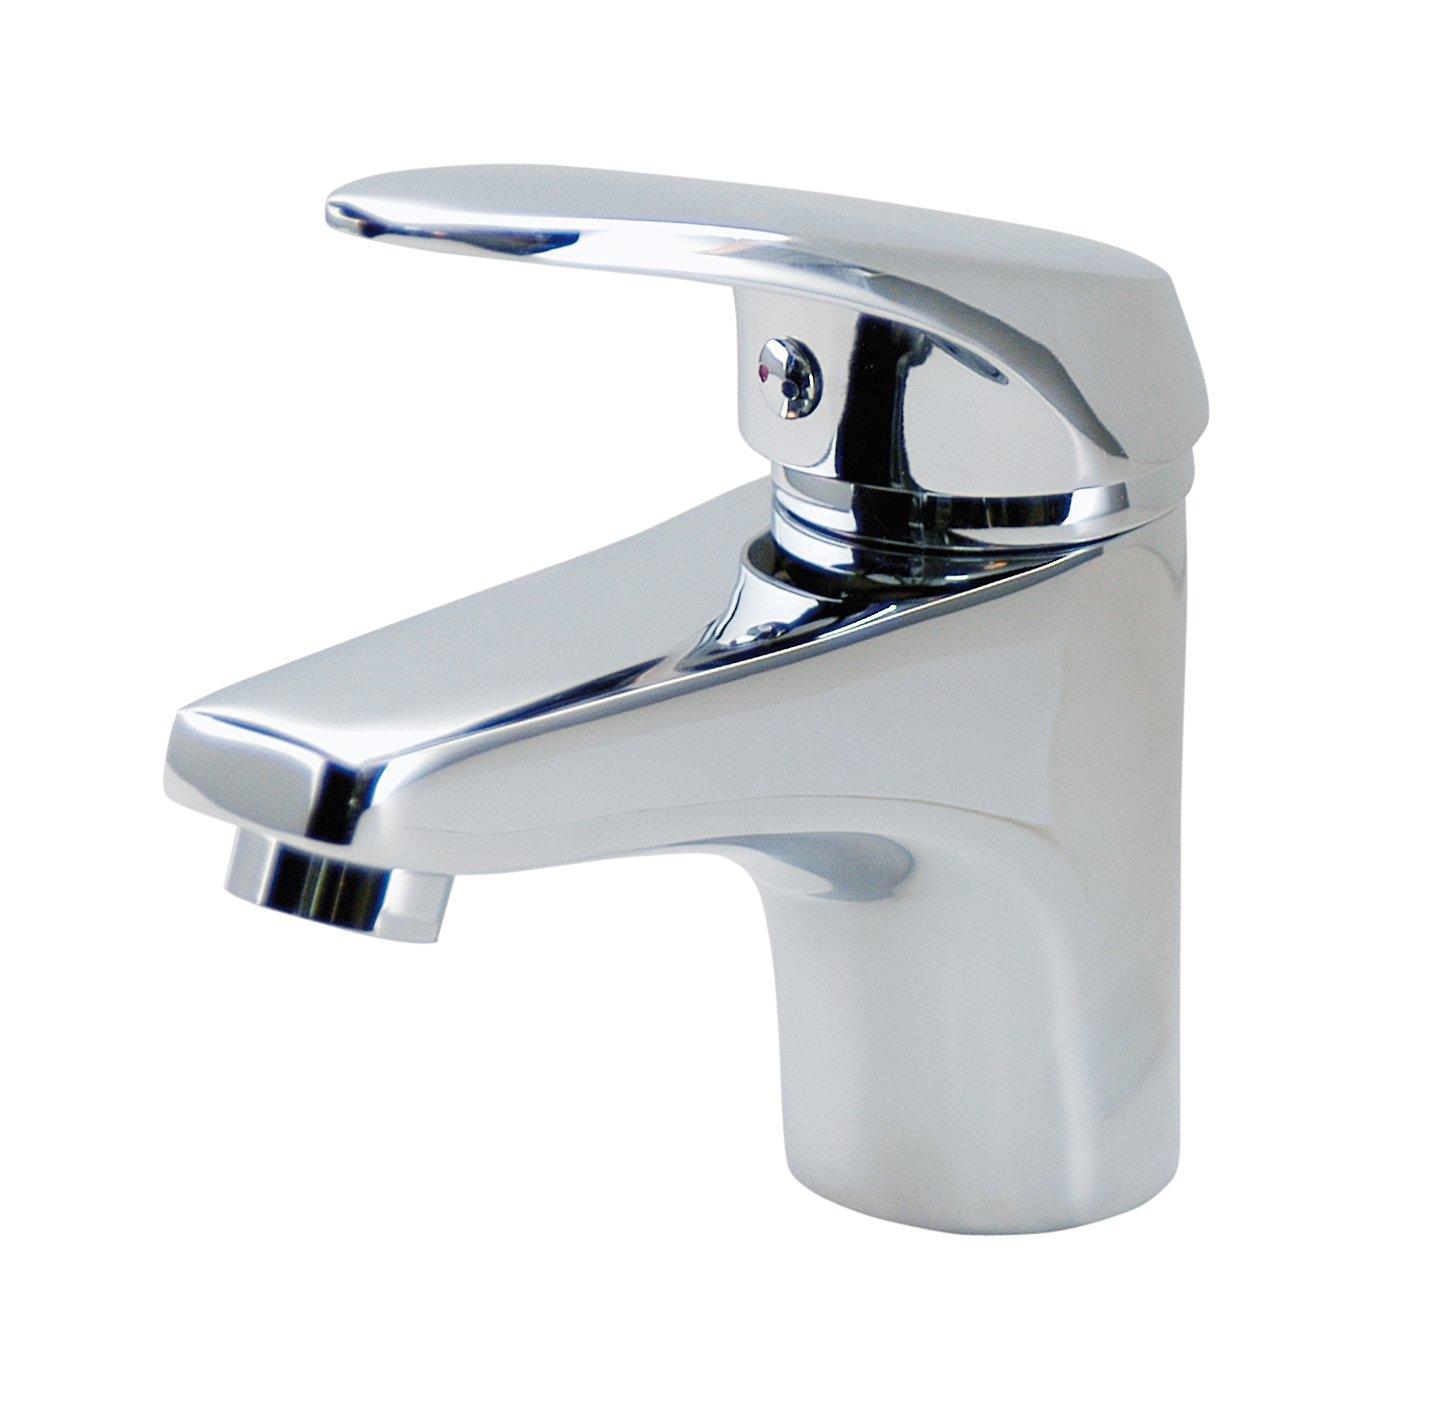 Plateado DP Grifer/ía SCER-0001 Grifo de lavabo monomando serie Sauce